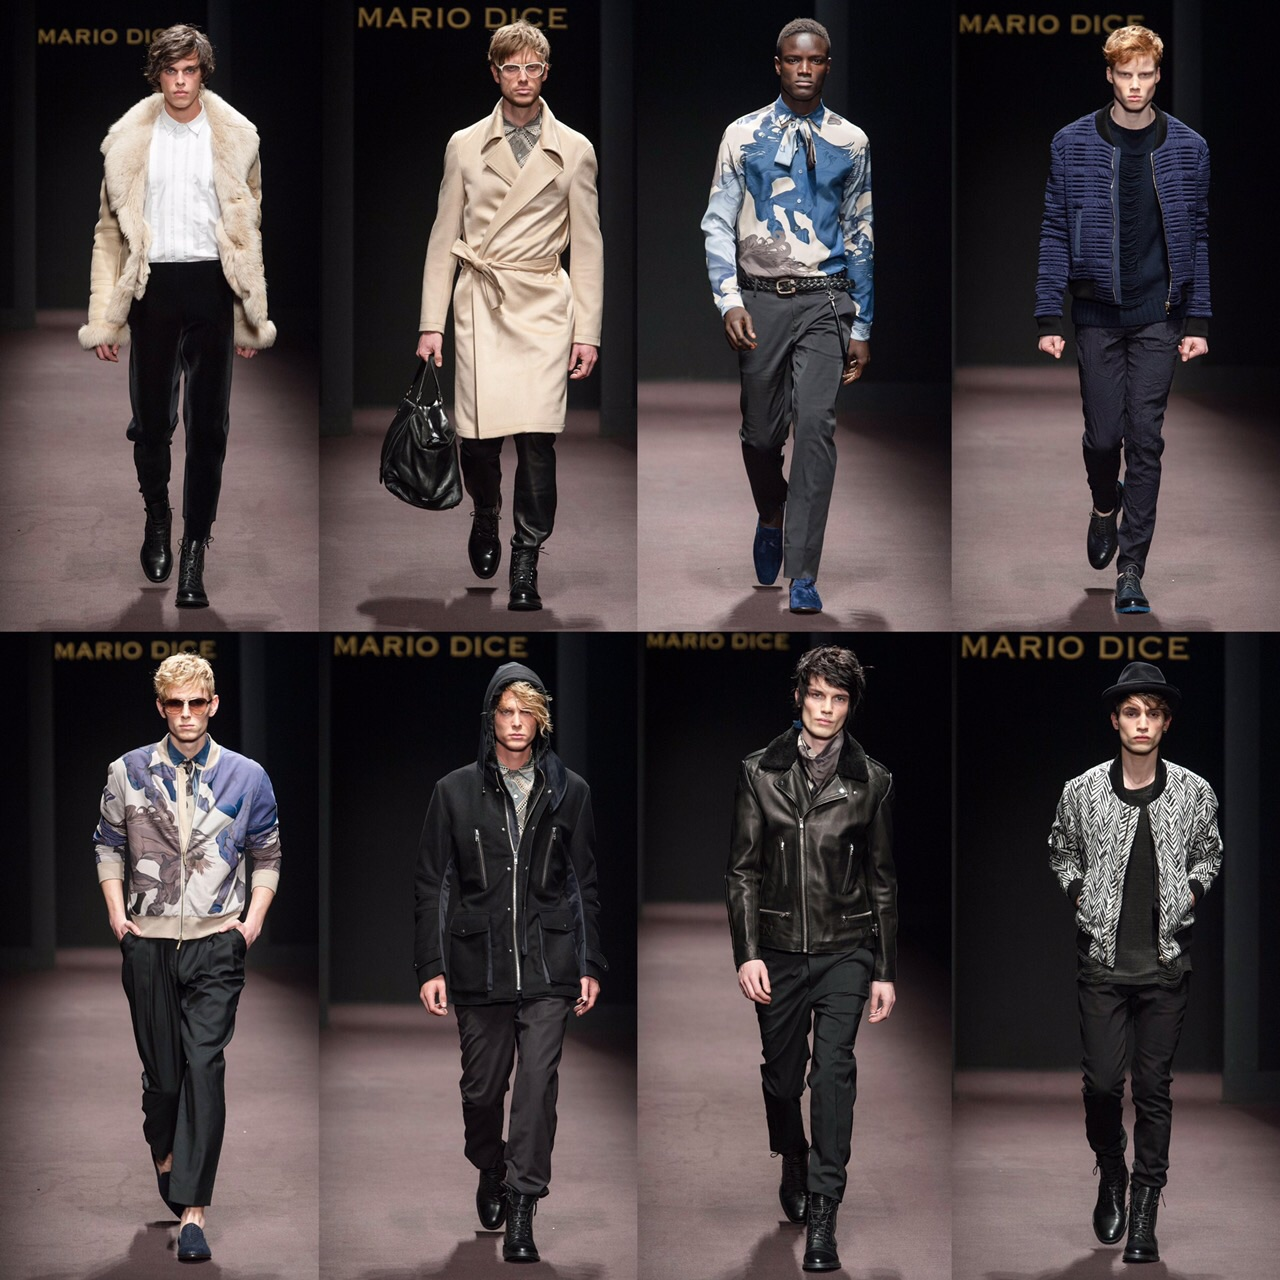 mario dice milano moda uomo autunno-inverno 2015-2016 (2)